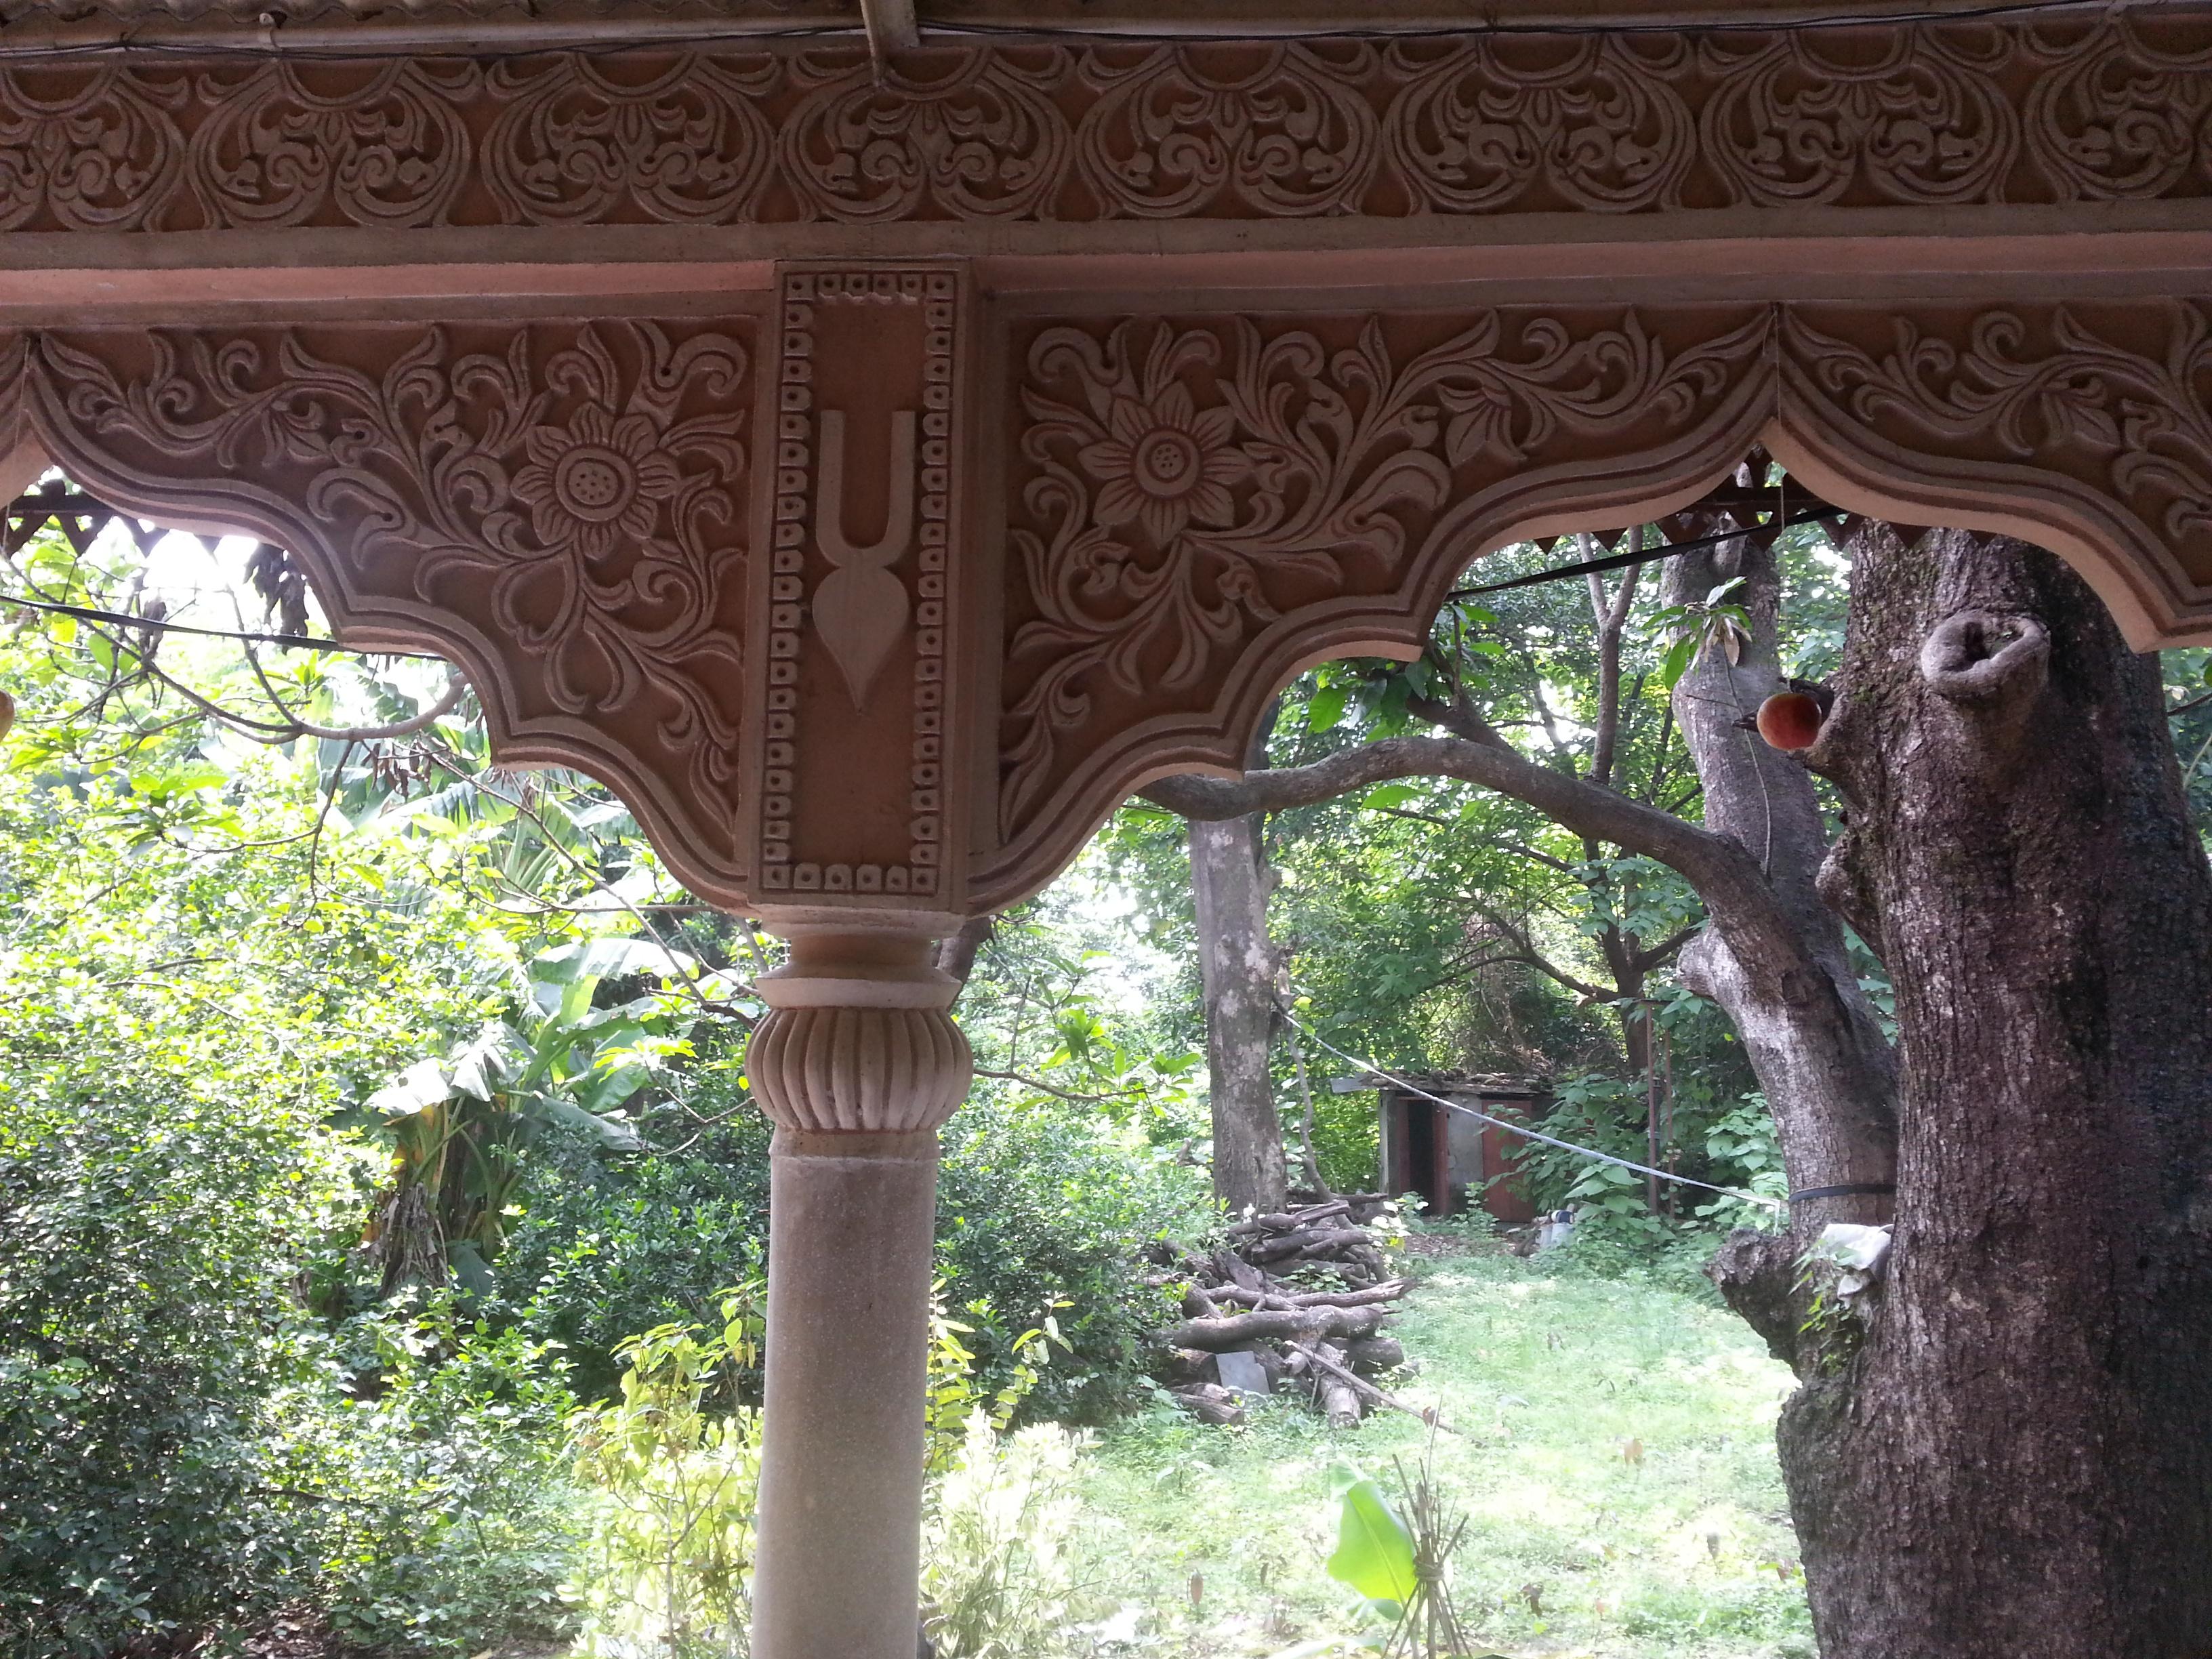 ISKON Temple Haridwar